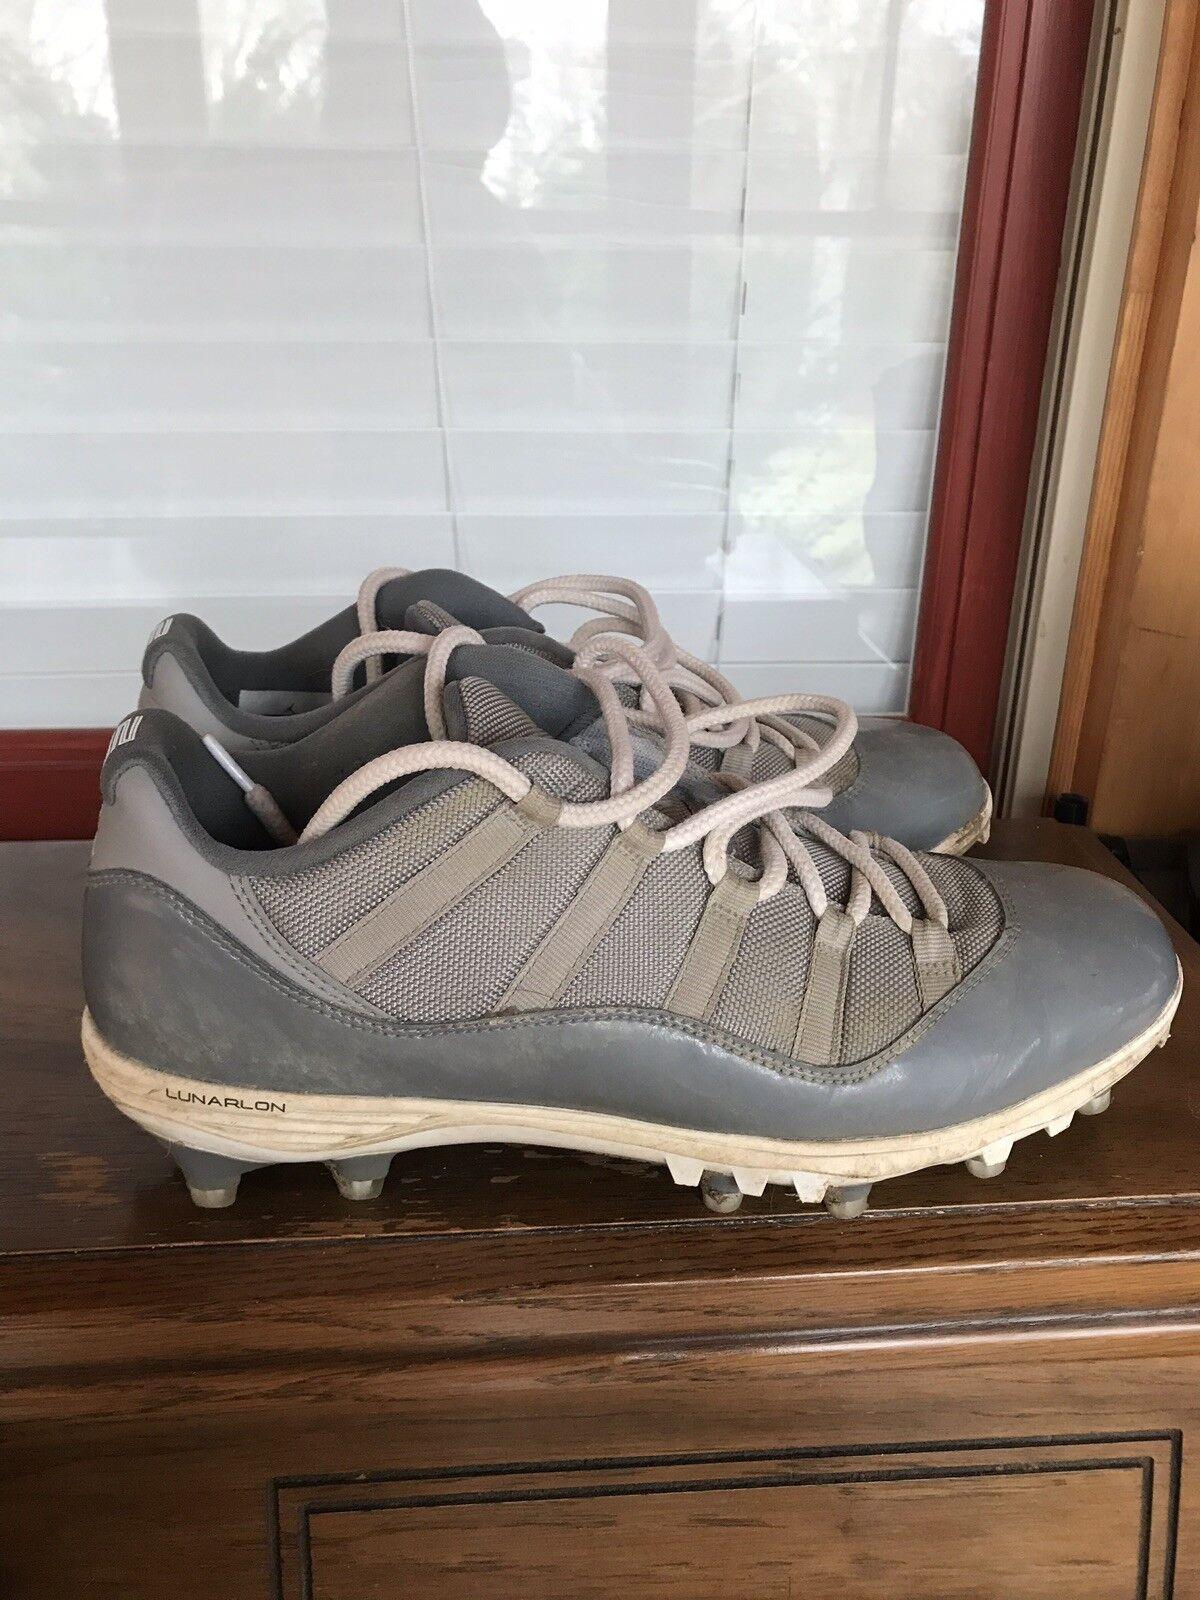 best cheap 0e10e 95525 Nike Jordan Low 11 Cool Grey Grey Grey Cleats Size 12 9a280d ...